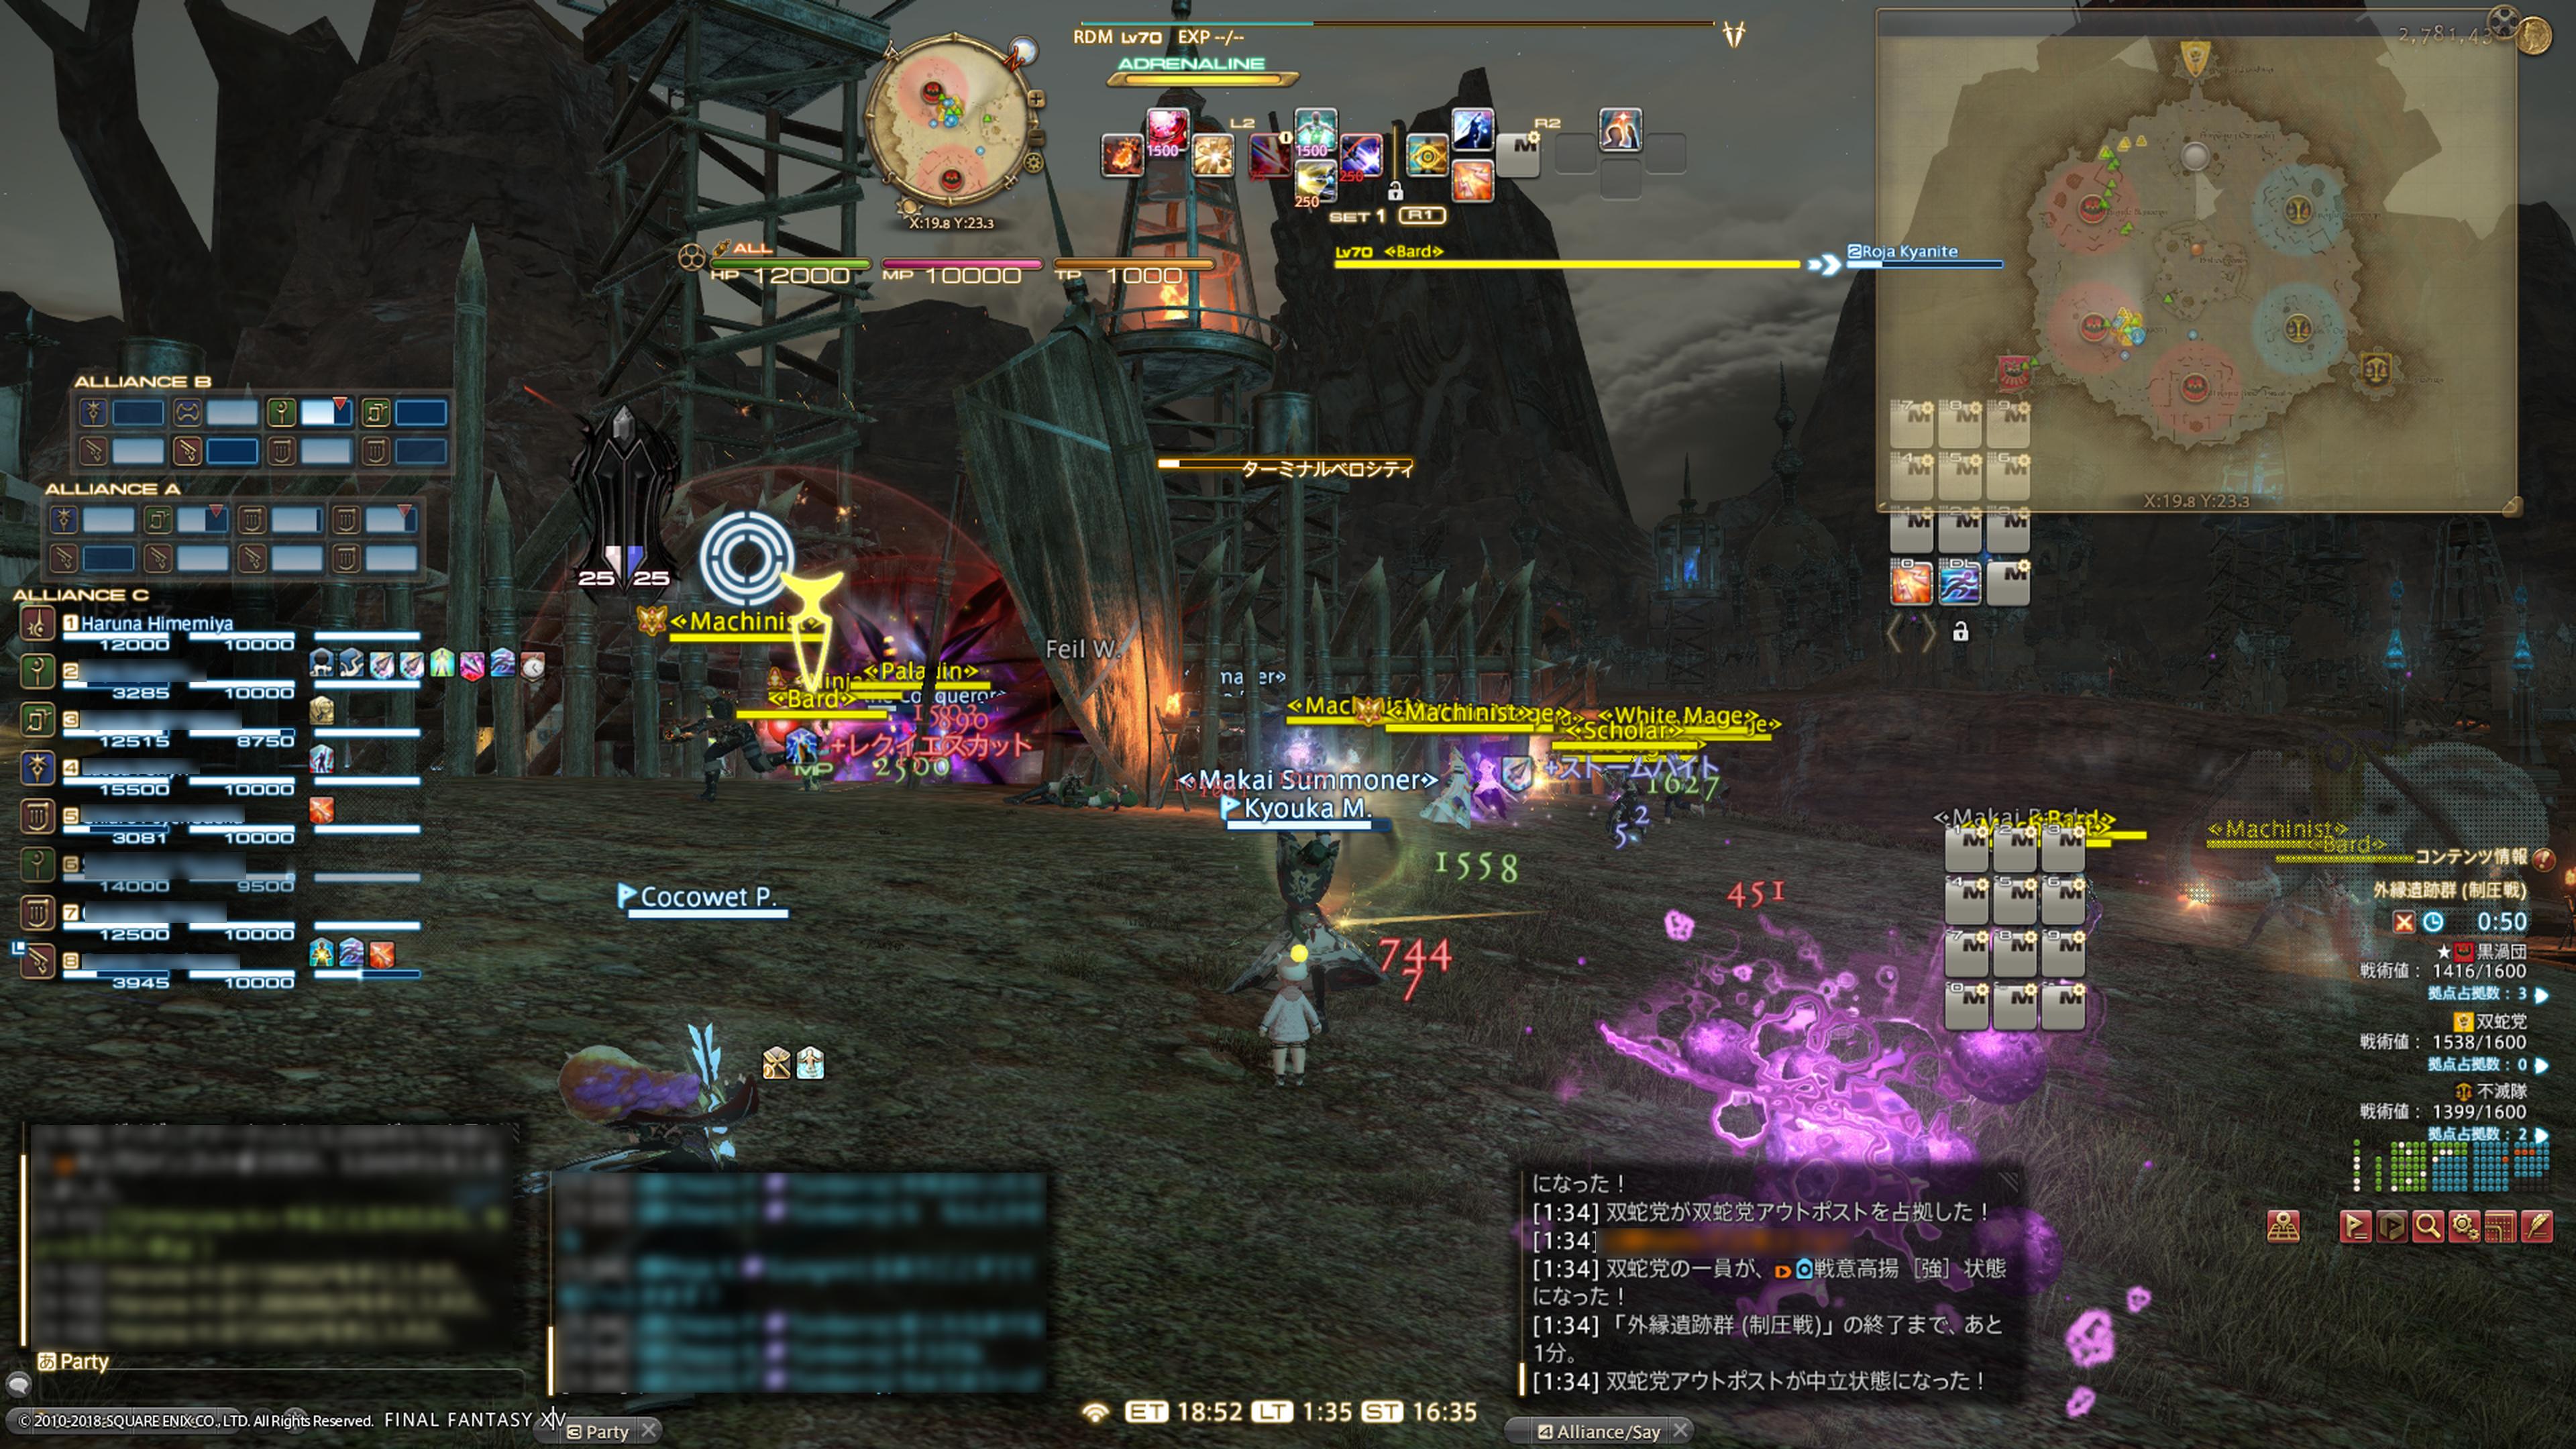 Haruna Himemiya 日記「PS4Pro、4K画質が凄い(追記あり)」 | FINAL